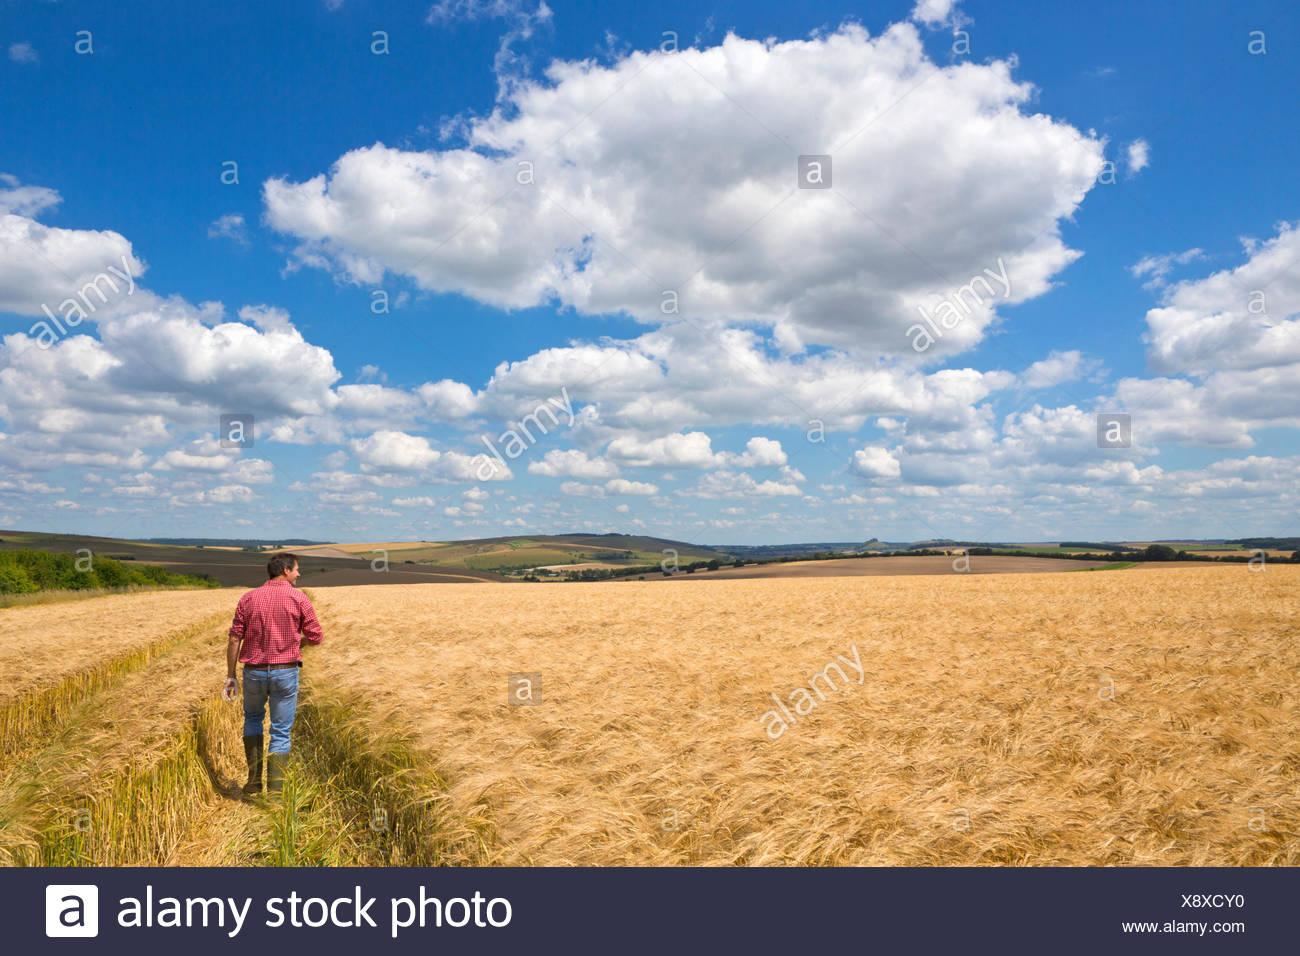 Farmer walking through sunny rural barley crop field in summer - Stock Image